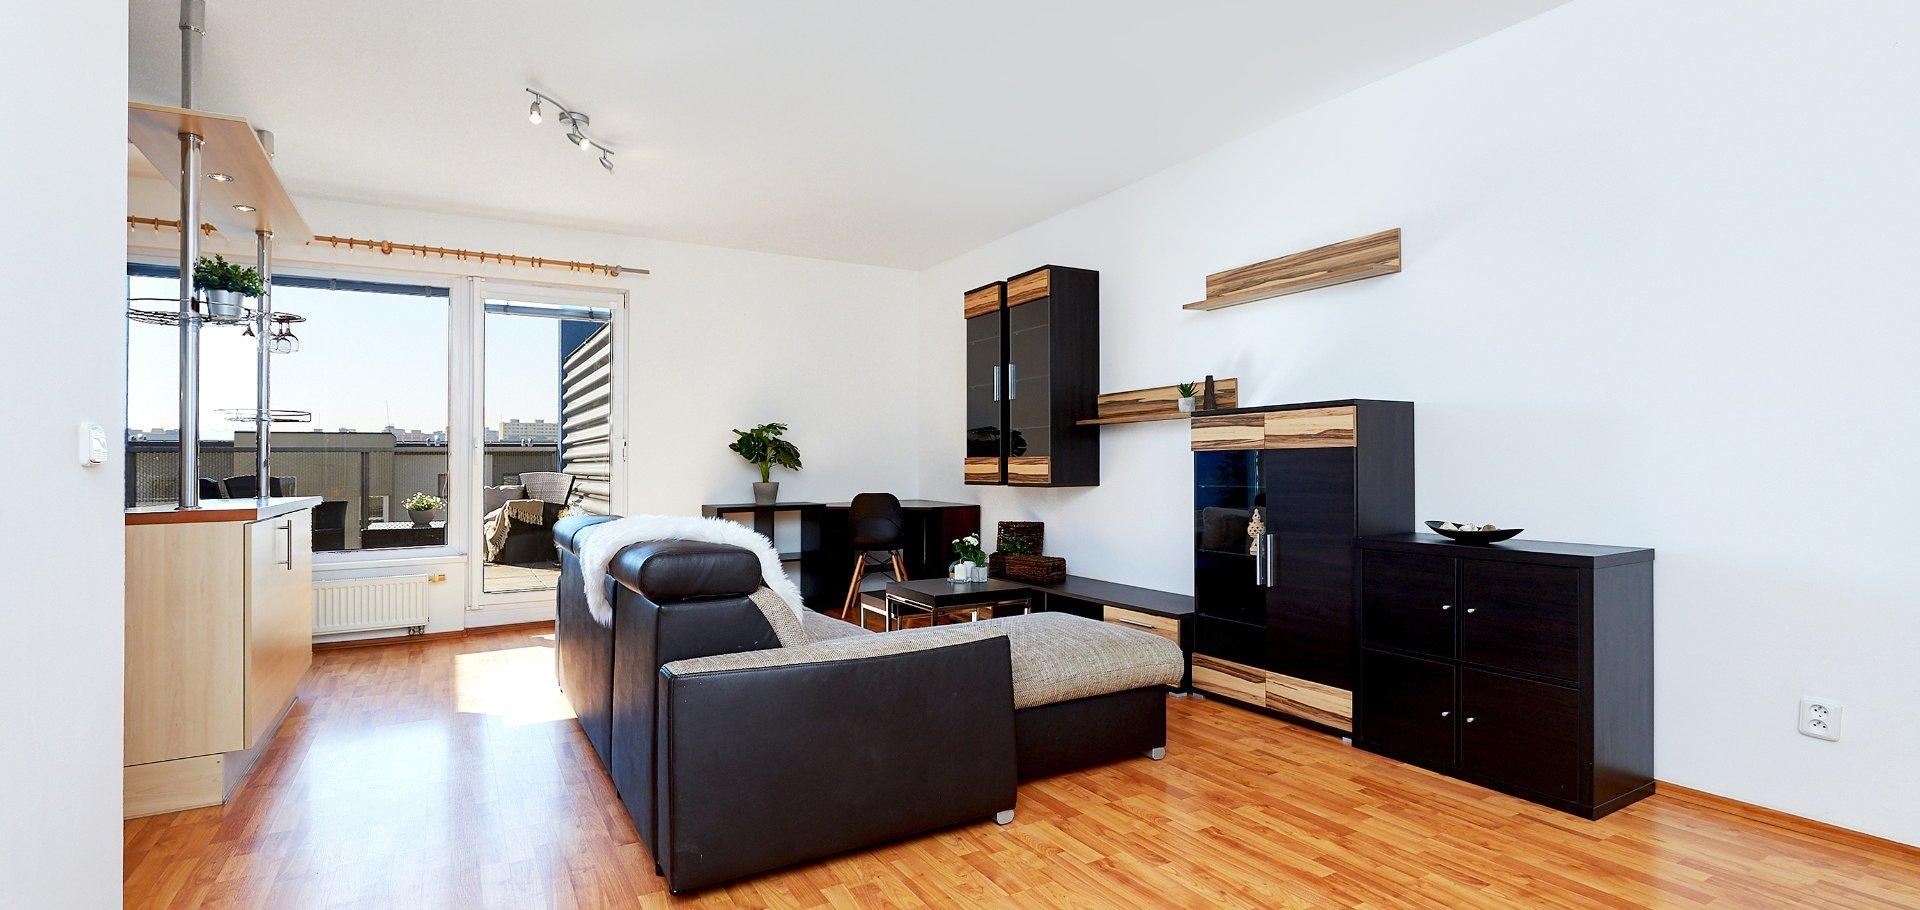 Pronájem bytu 2+kk s terasou, 56m², Praha - Hostivař